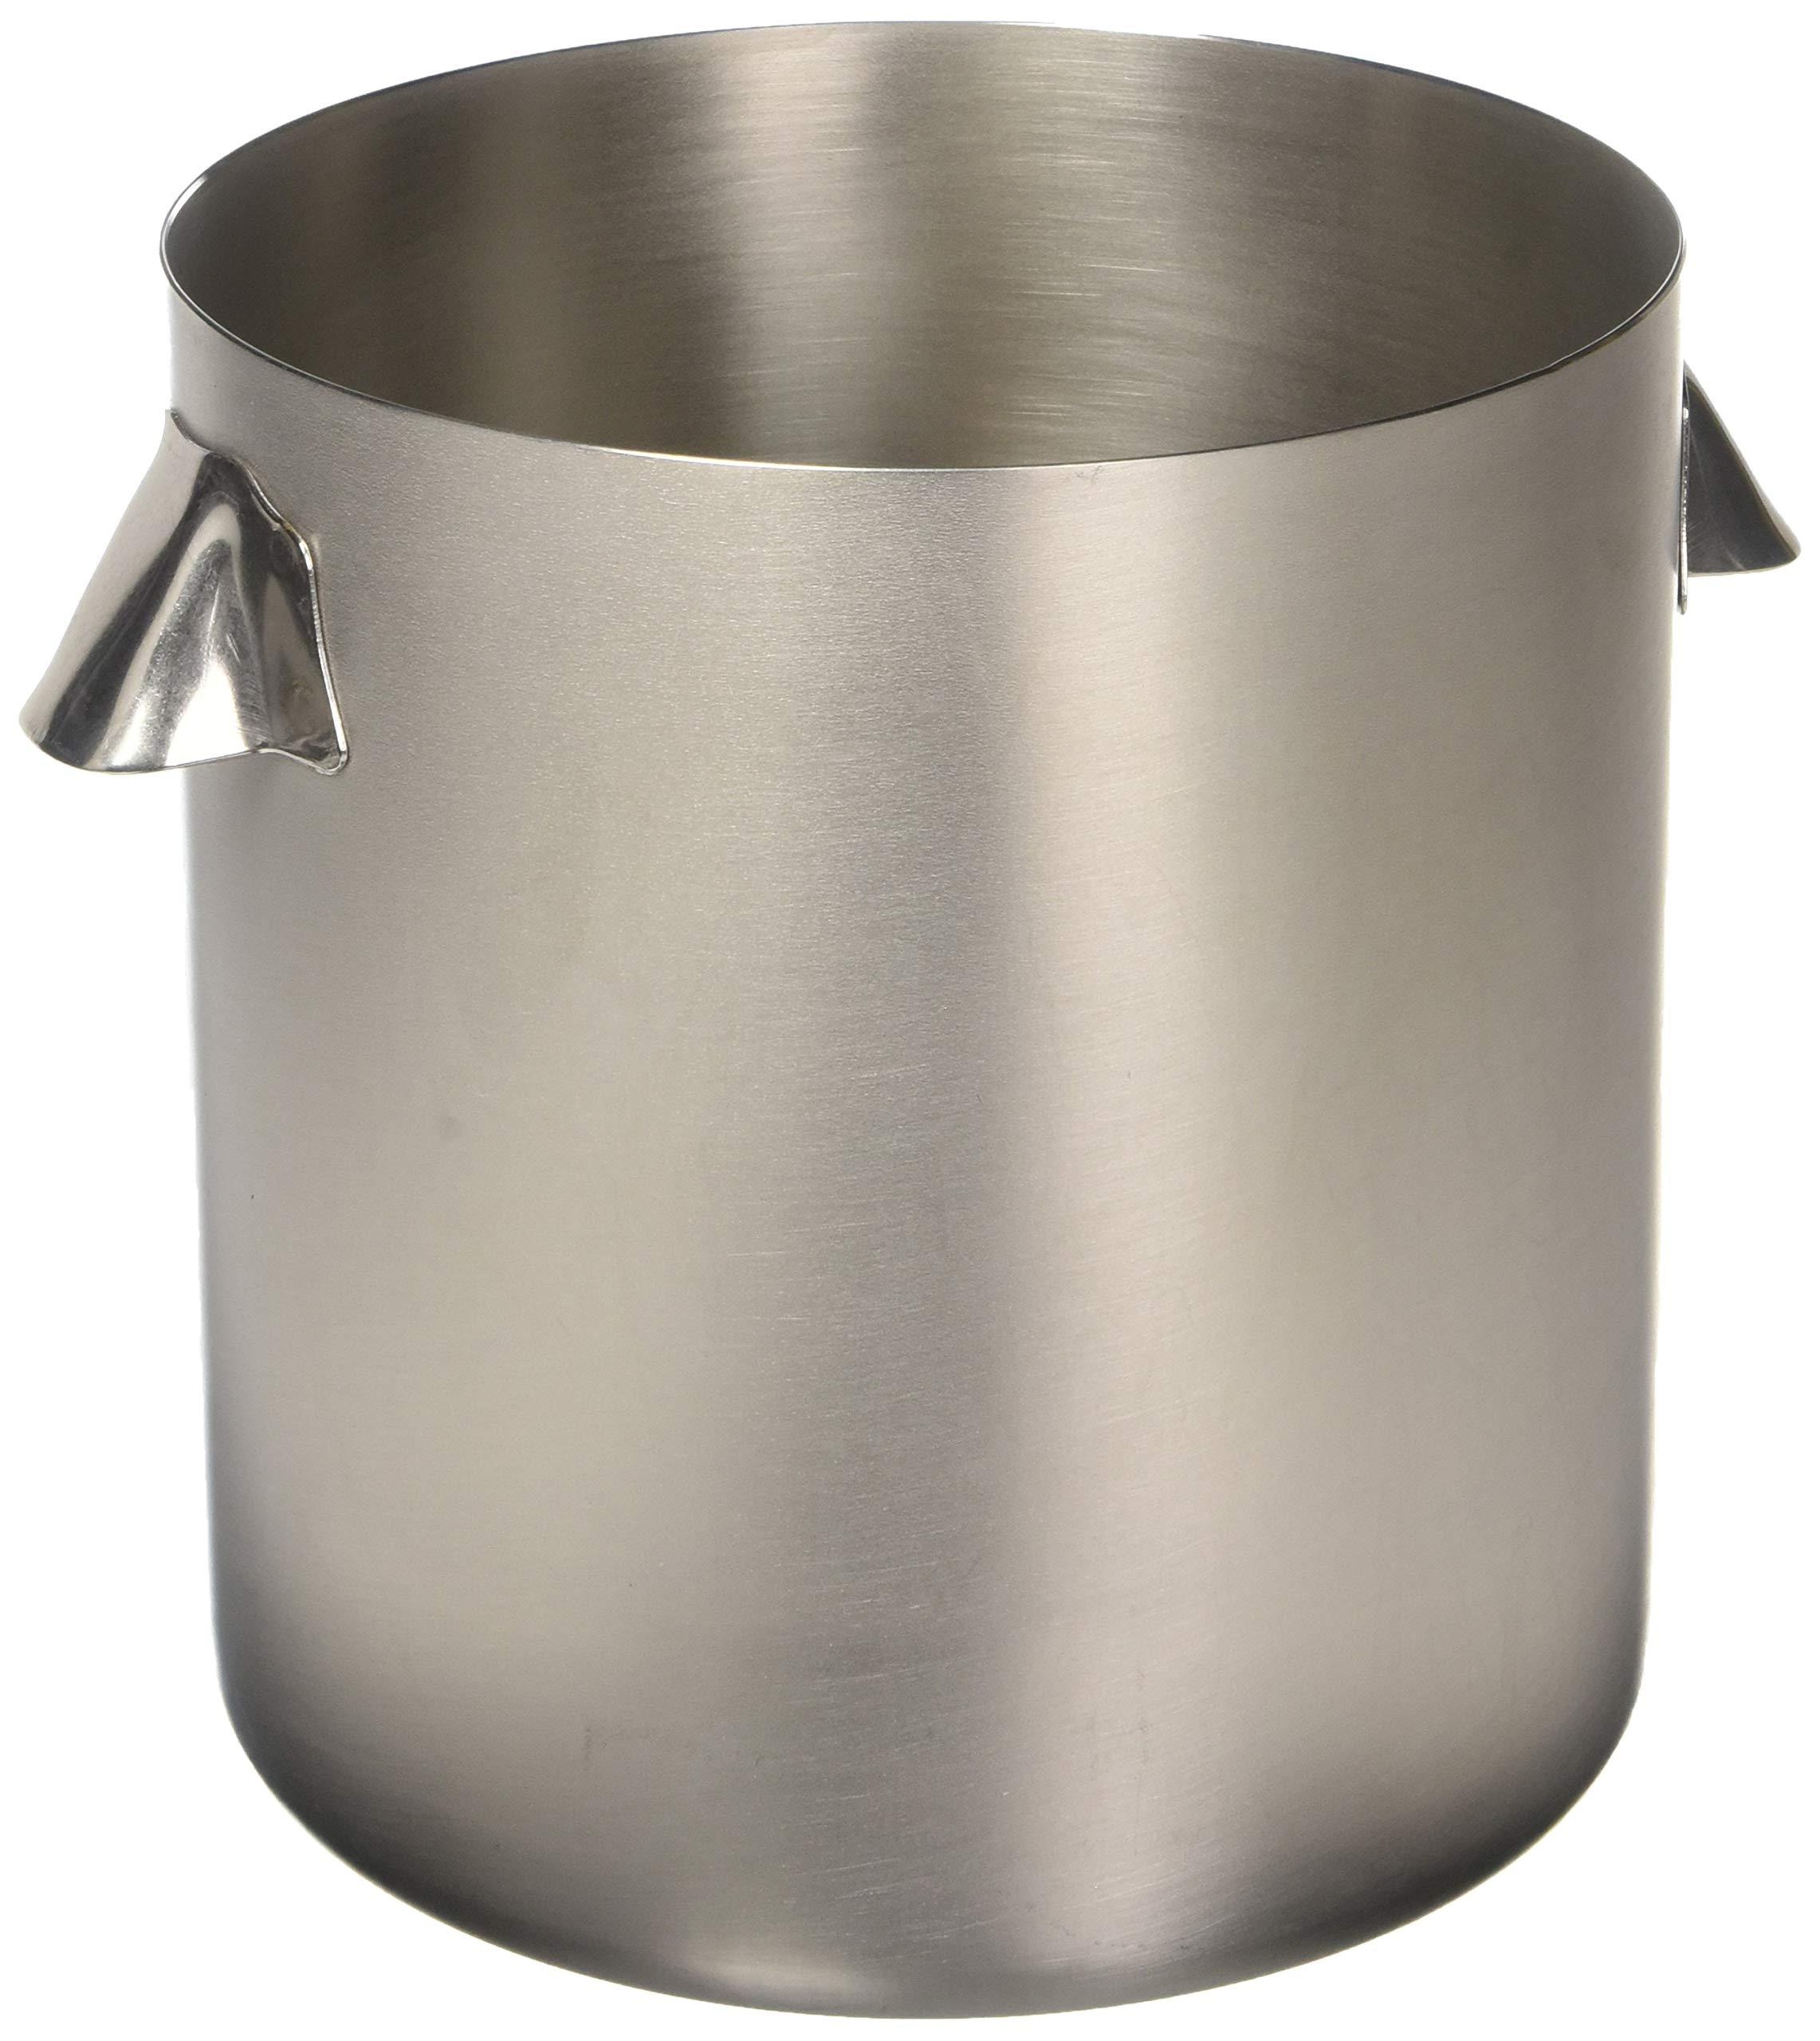 Paderno World Cuisine 5-1/4-Quart Stainless-steel Bain-Marie (2 short handles)